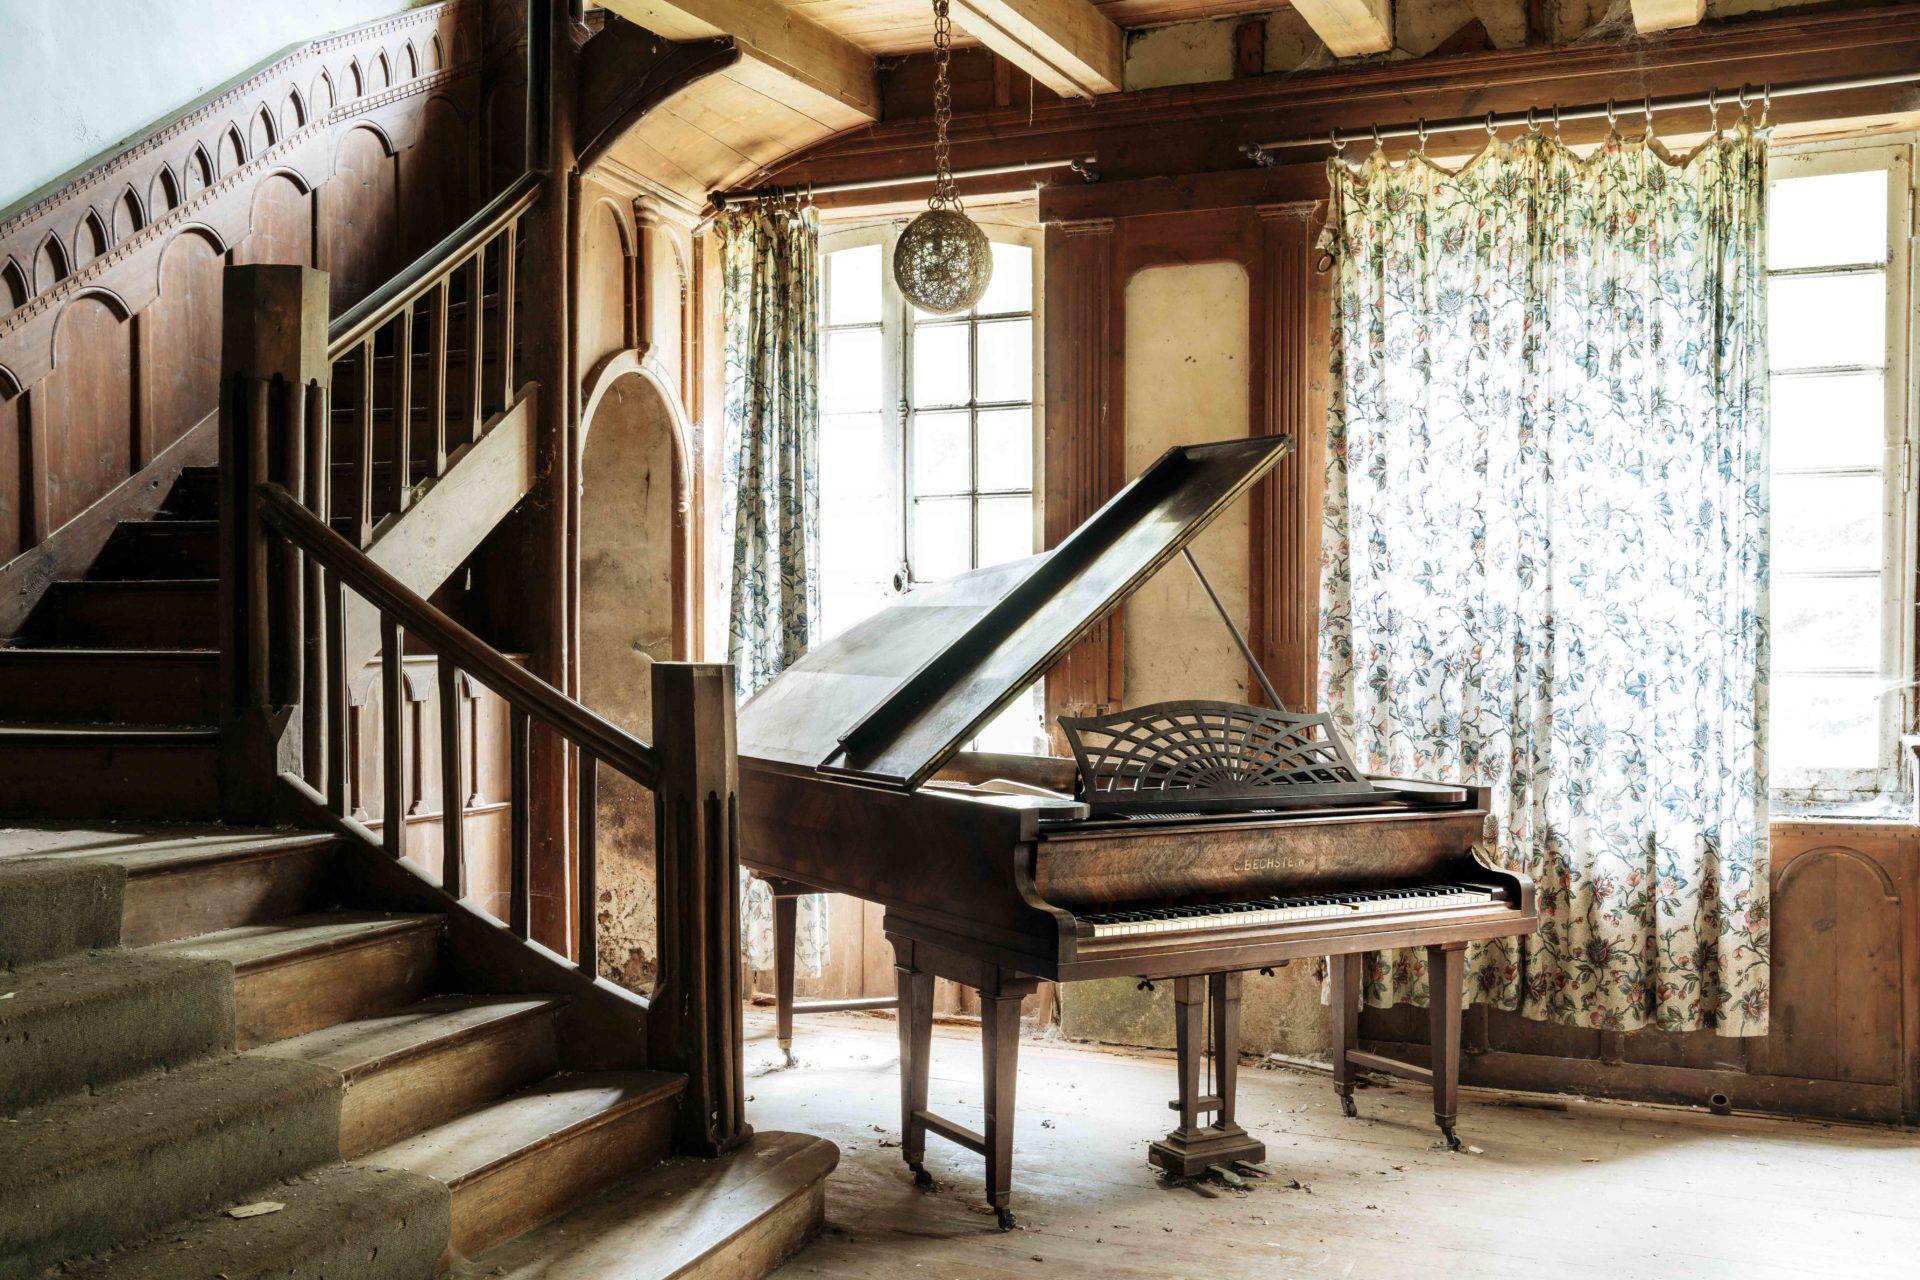 Requiem pour pianos 67 | Serie Requiem pour pianos | Romain Thiery | France